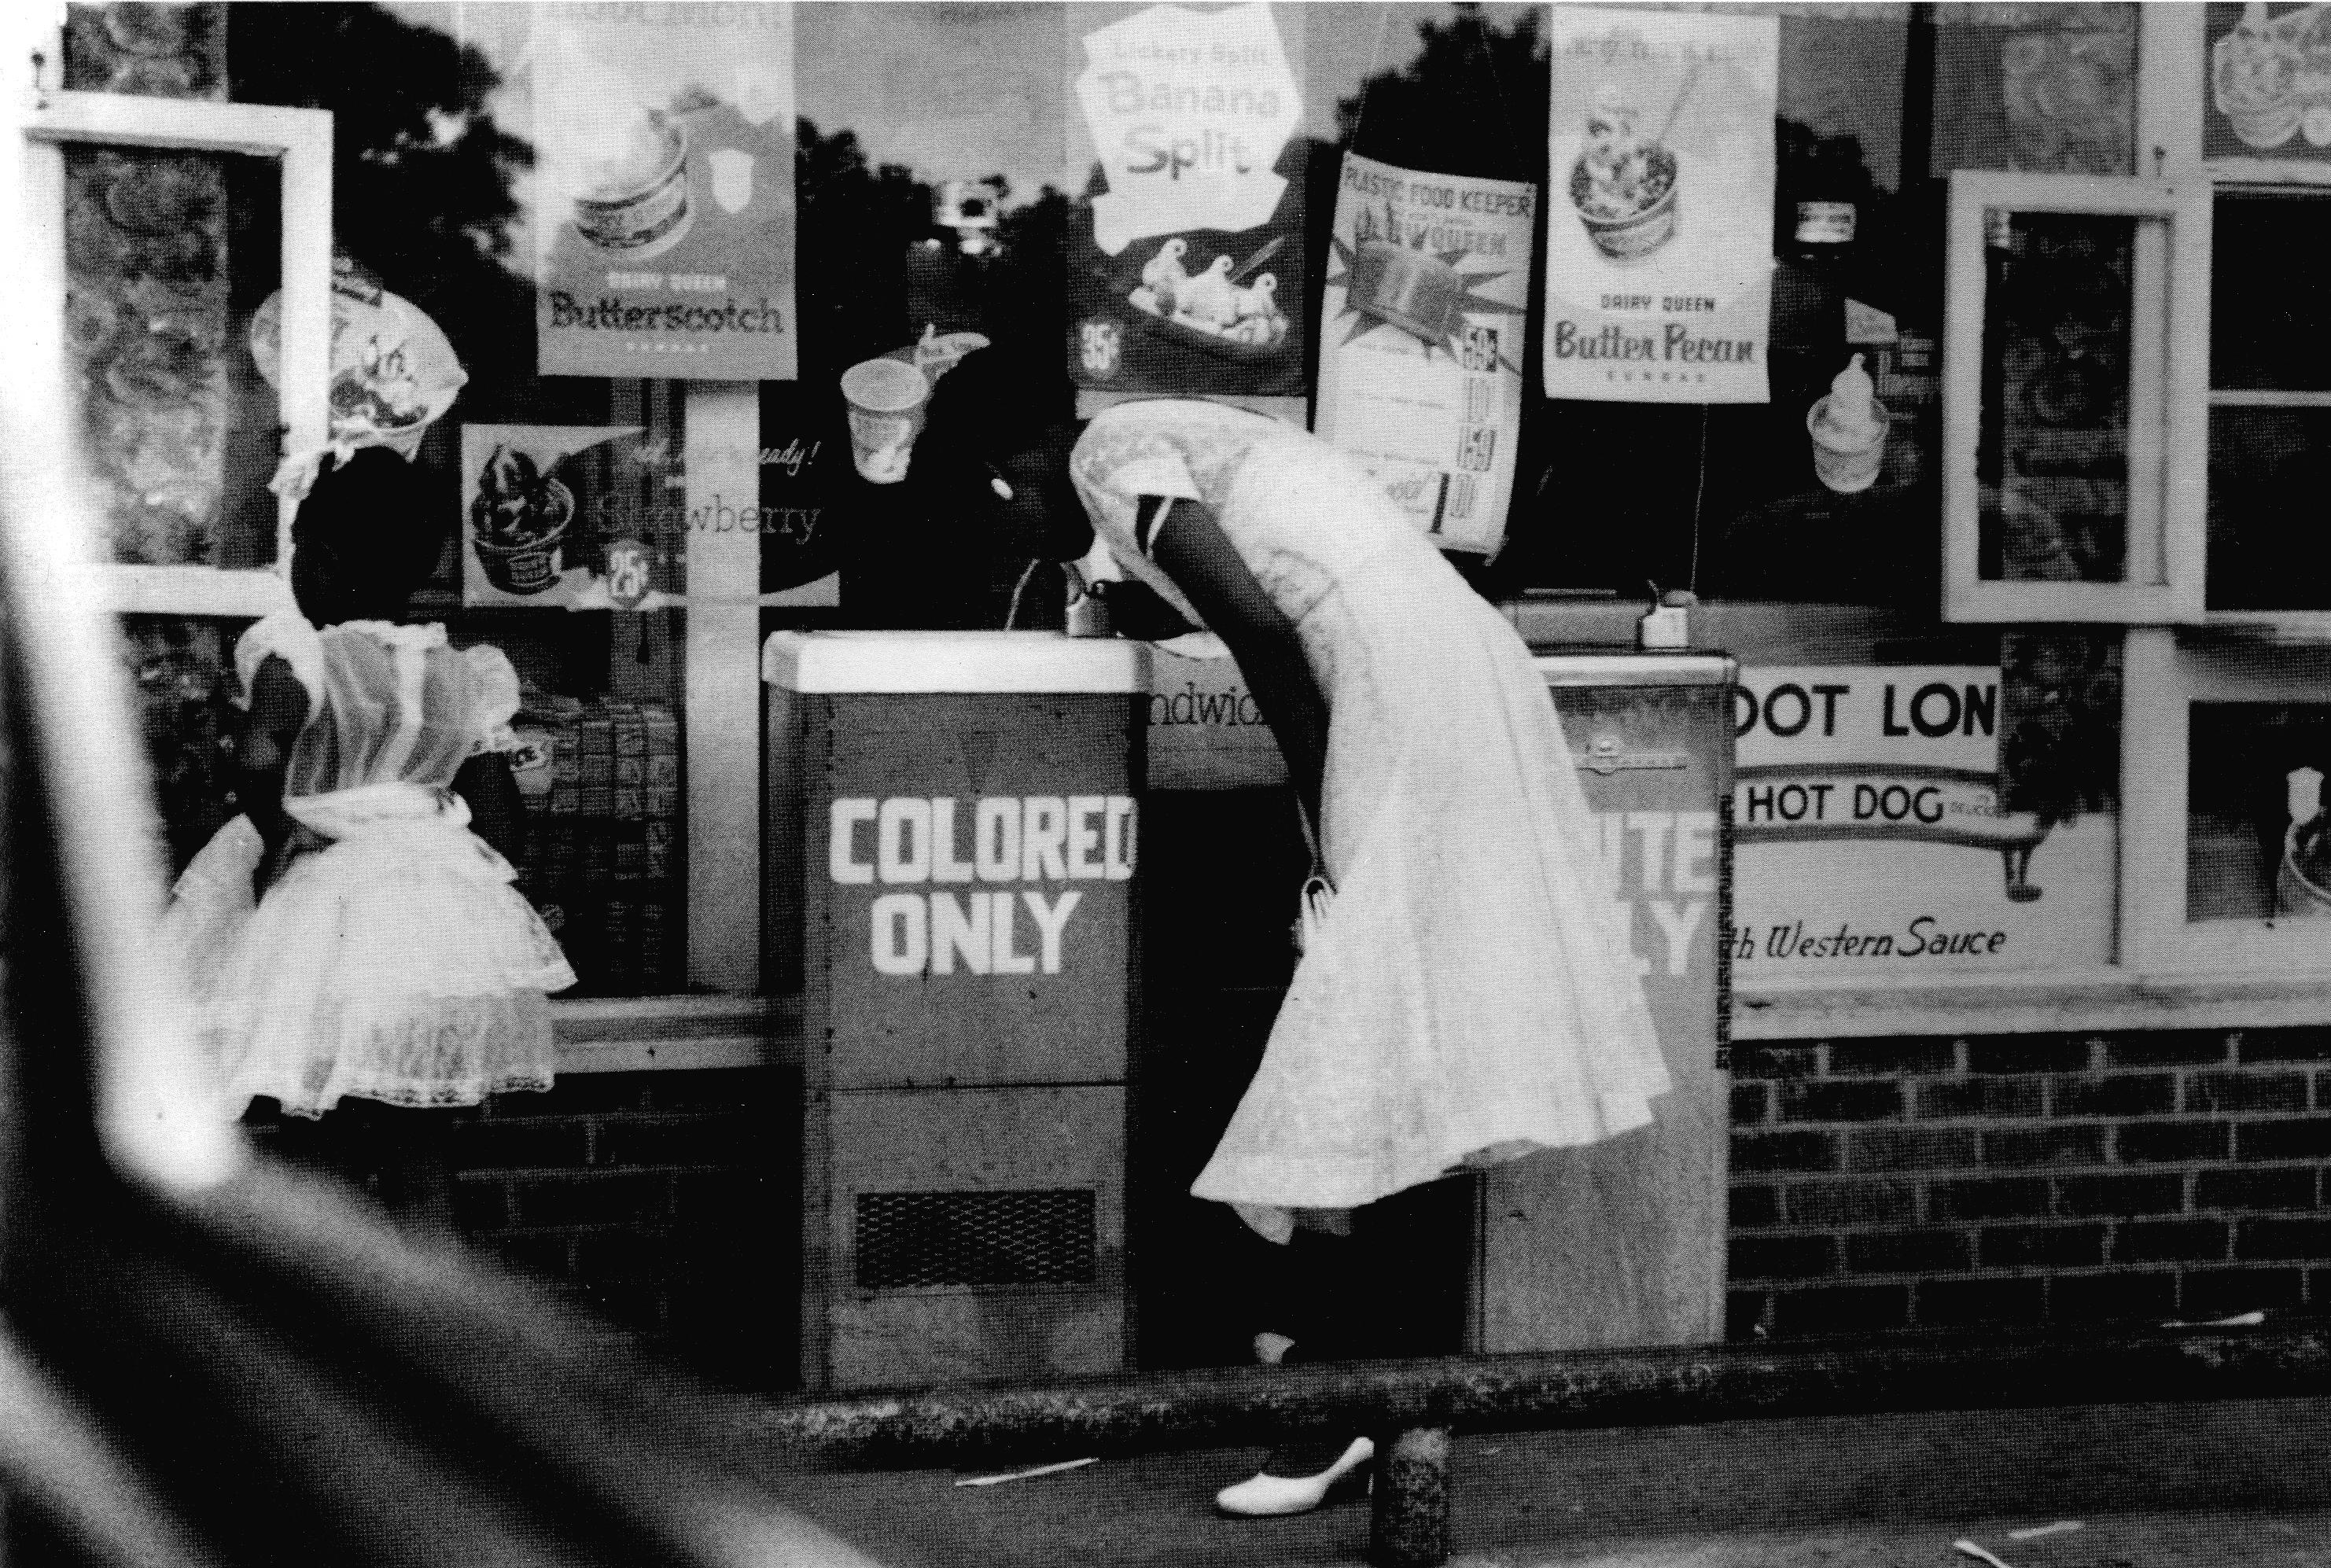 Drinking Fountain, Birmingham, Alabama 1956